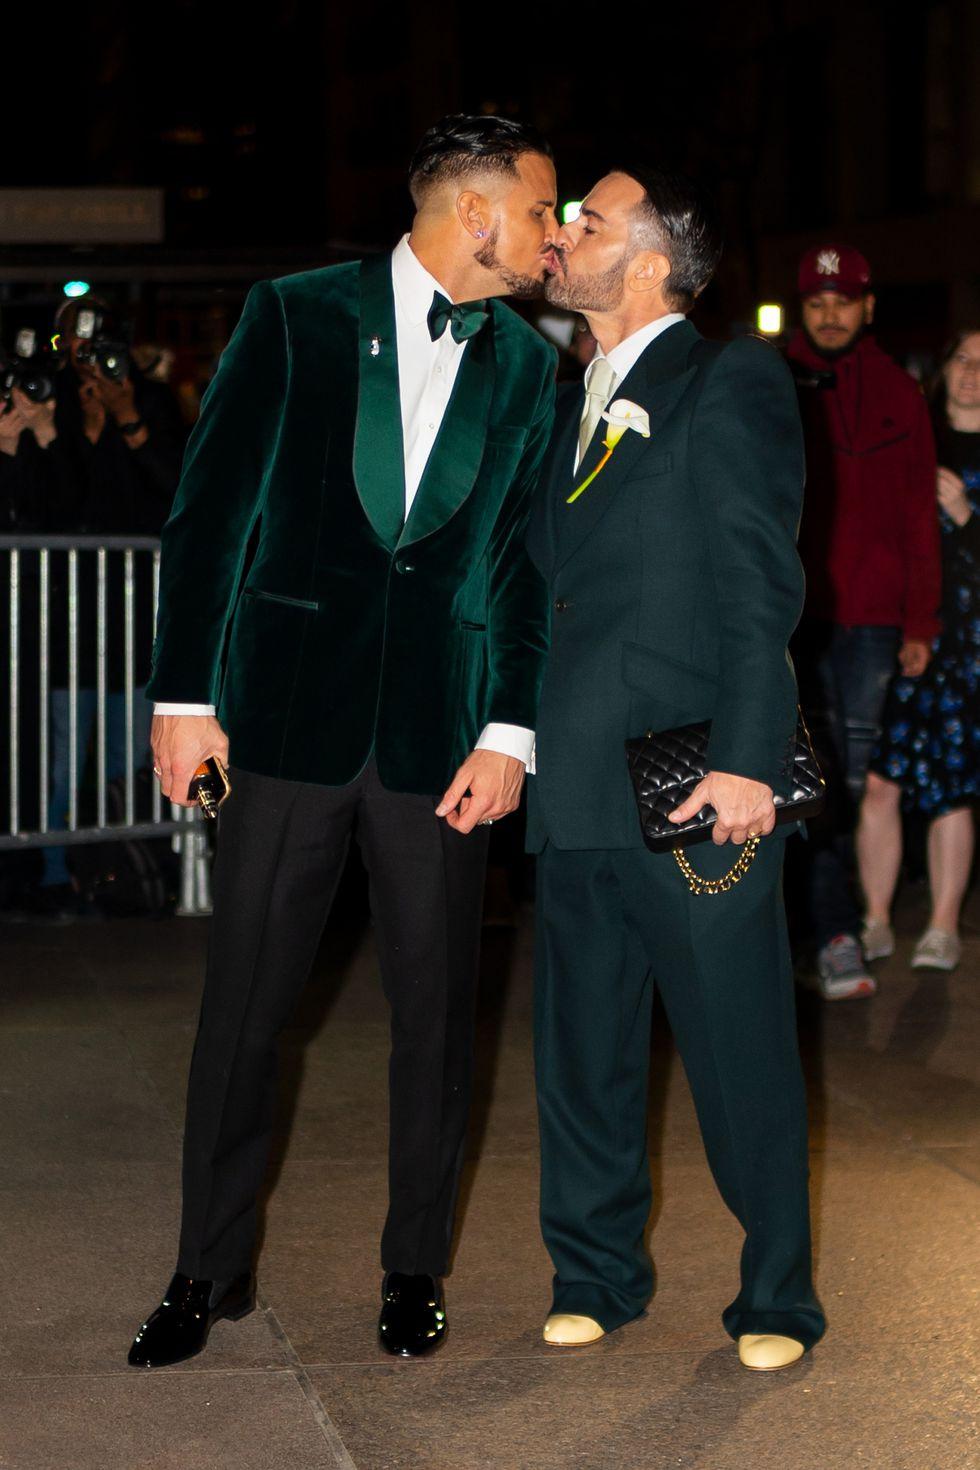 Marc Jacobs Wedding Photo.jpg